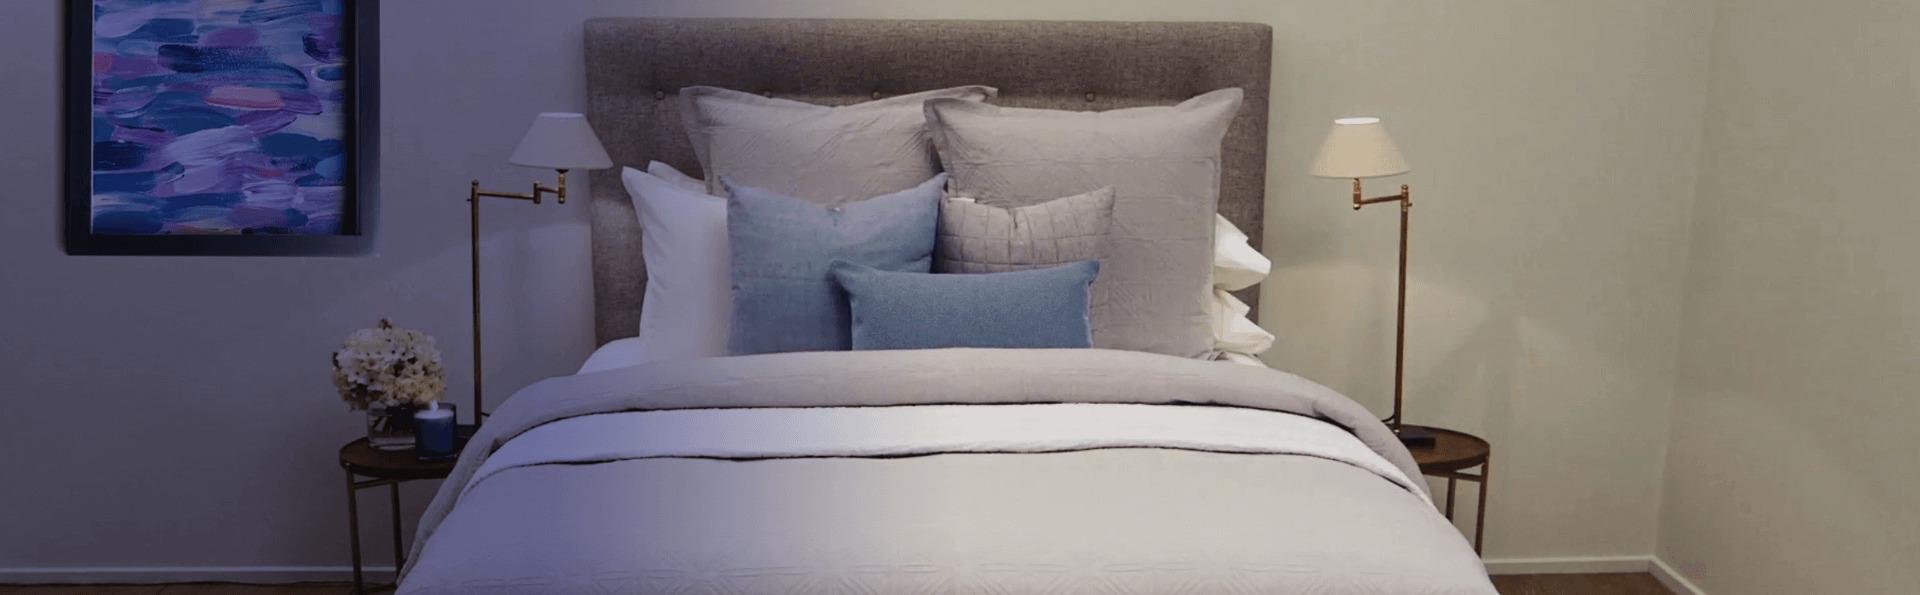 Beds For Backs (@cadencelily) Cover Image